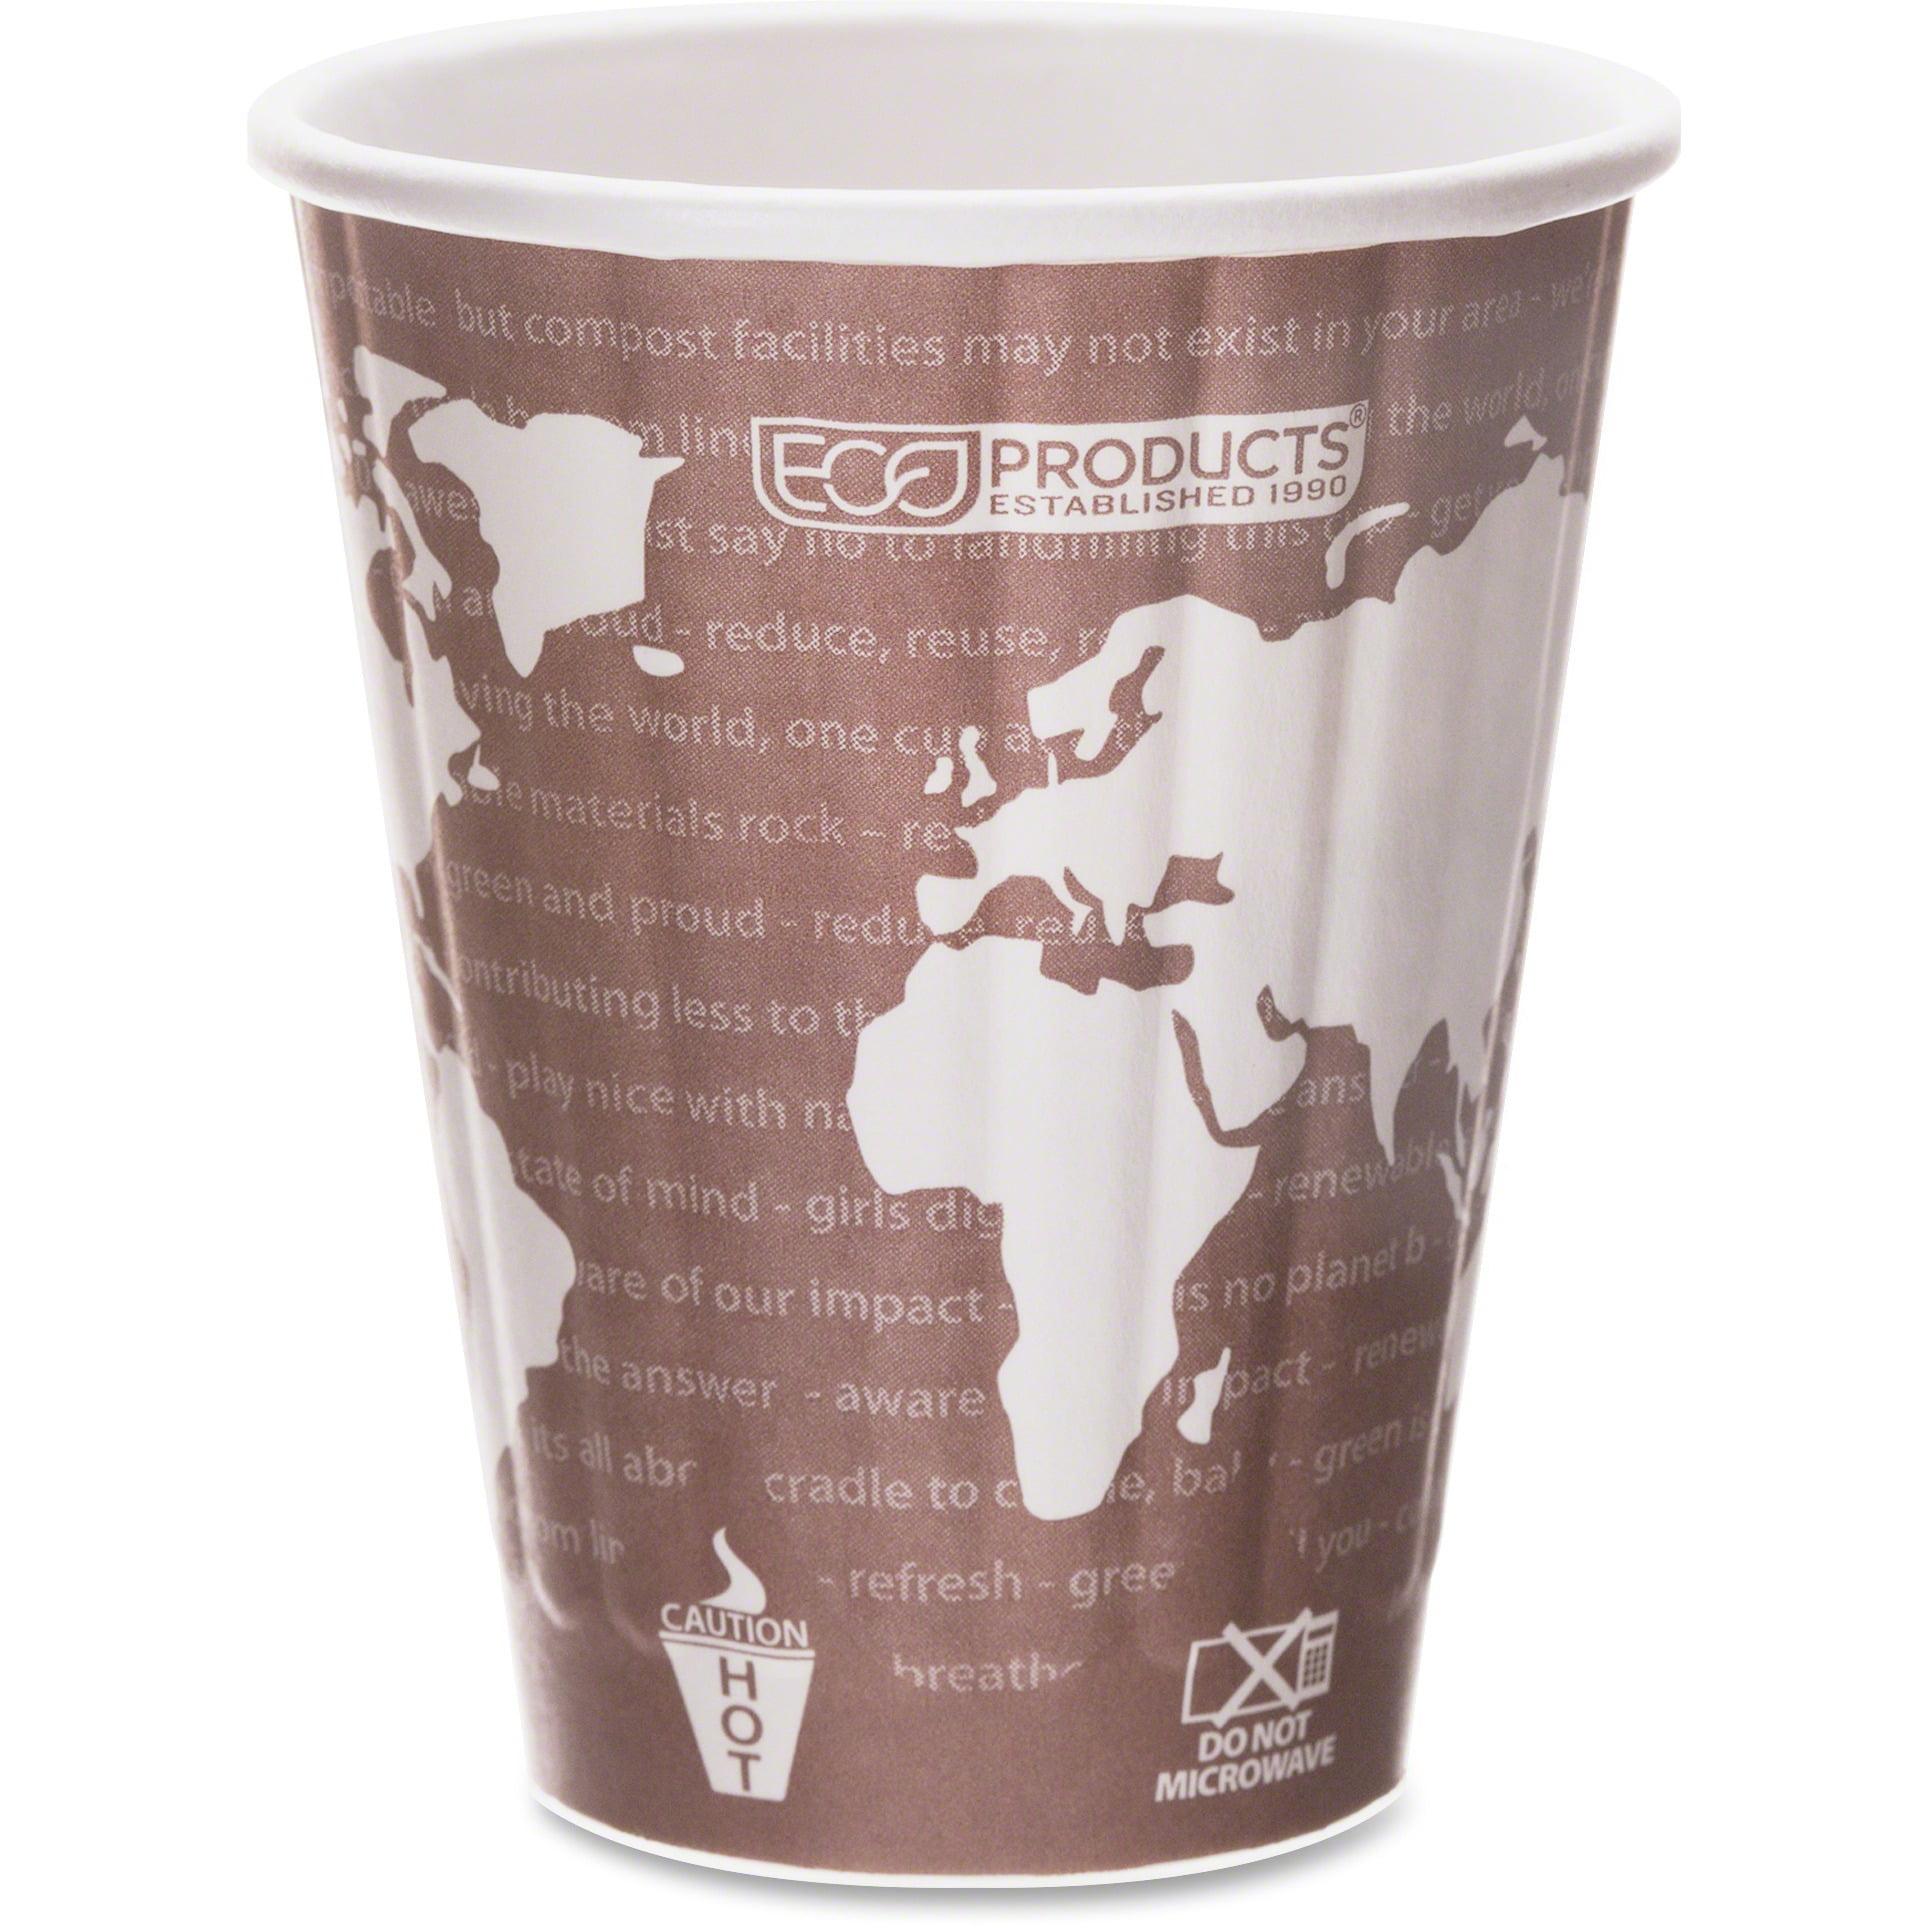 Eco-Products, ECOEPBNHC8WD, World Art Insulated Hot Cups, 800 / Carton, Maroon, 8 fl oz